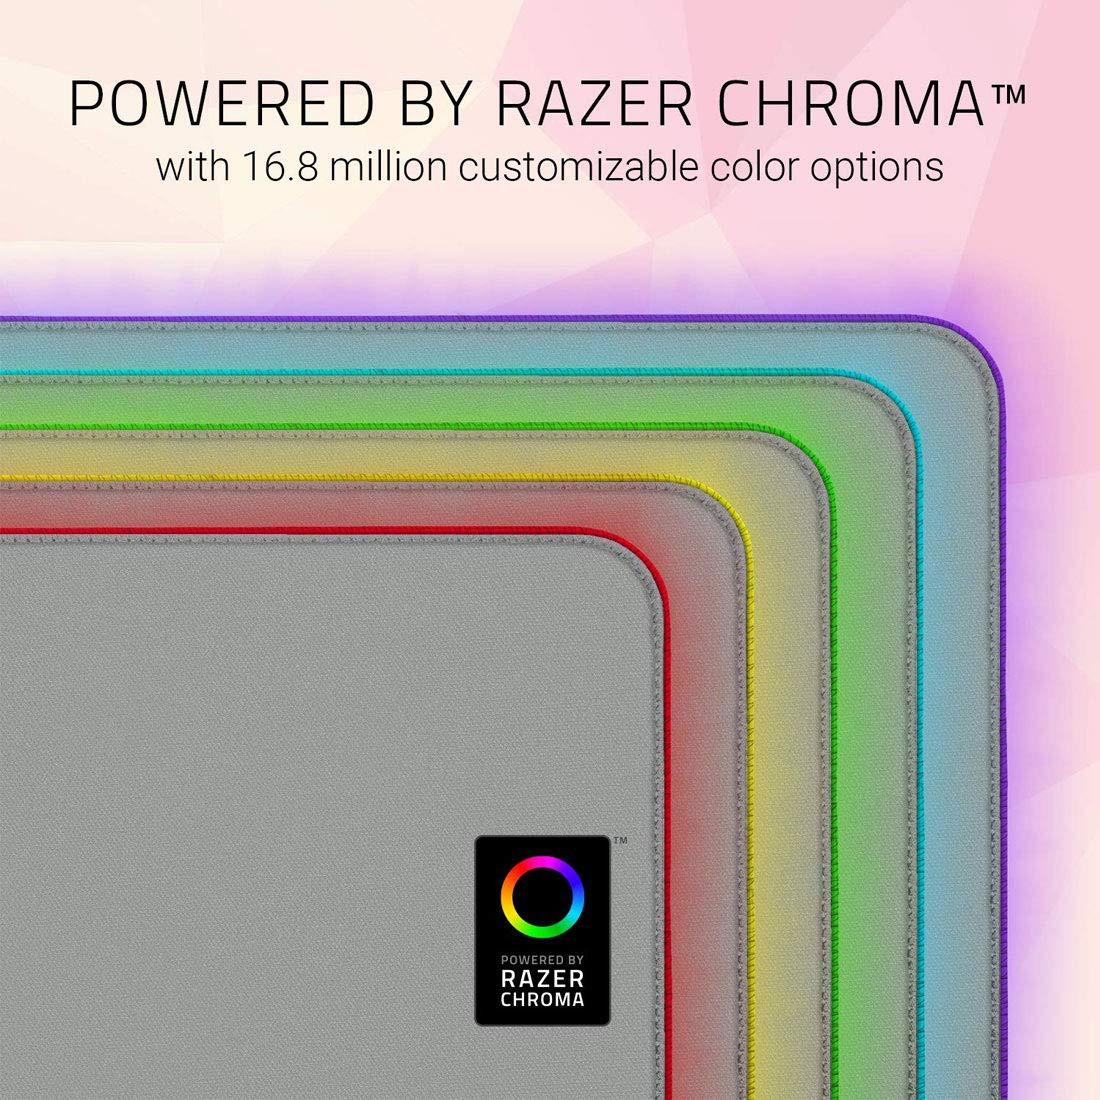 Razer Goliathus Extended  Quartz Pink Chroma 920x294x3mm surface